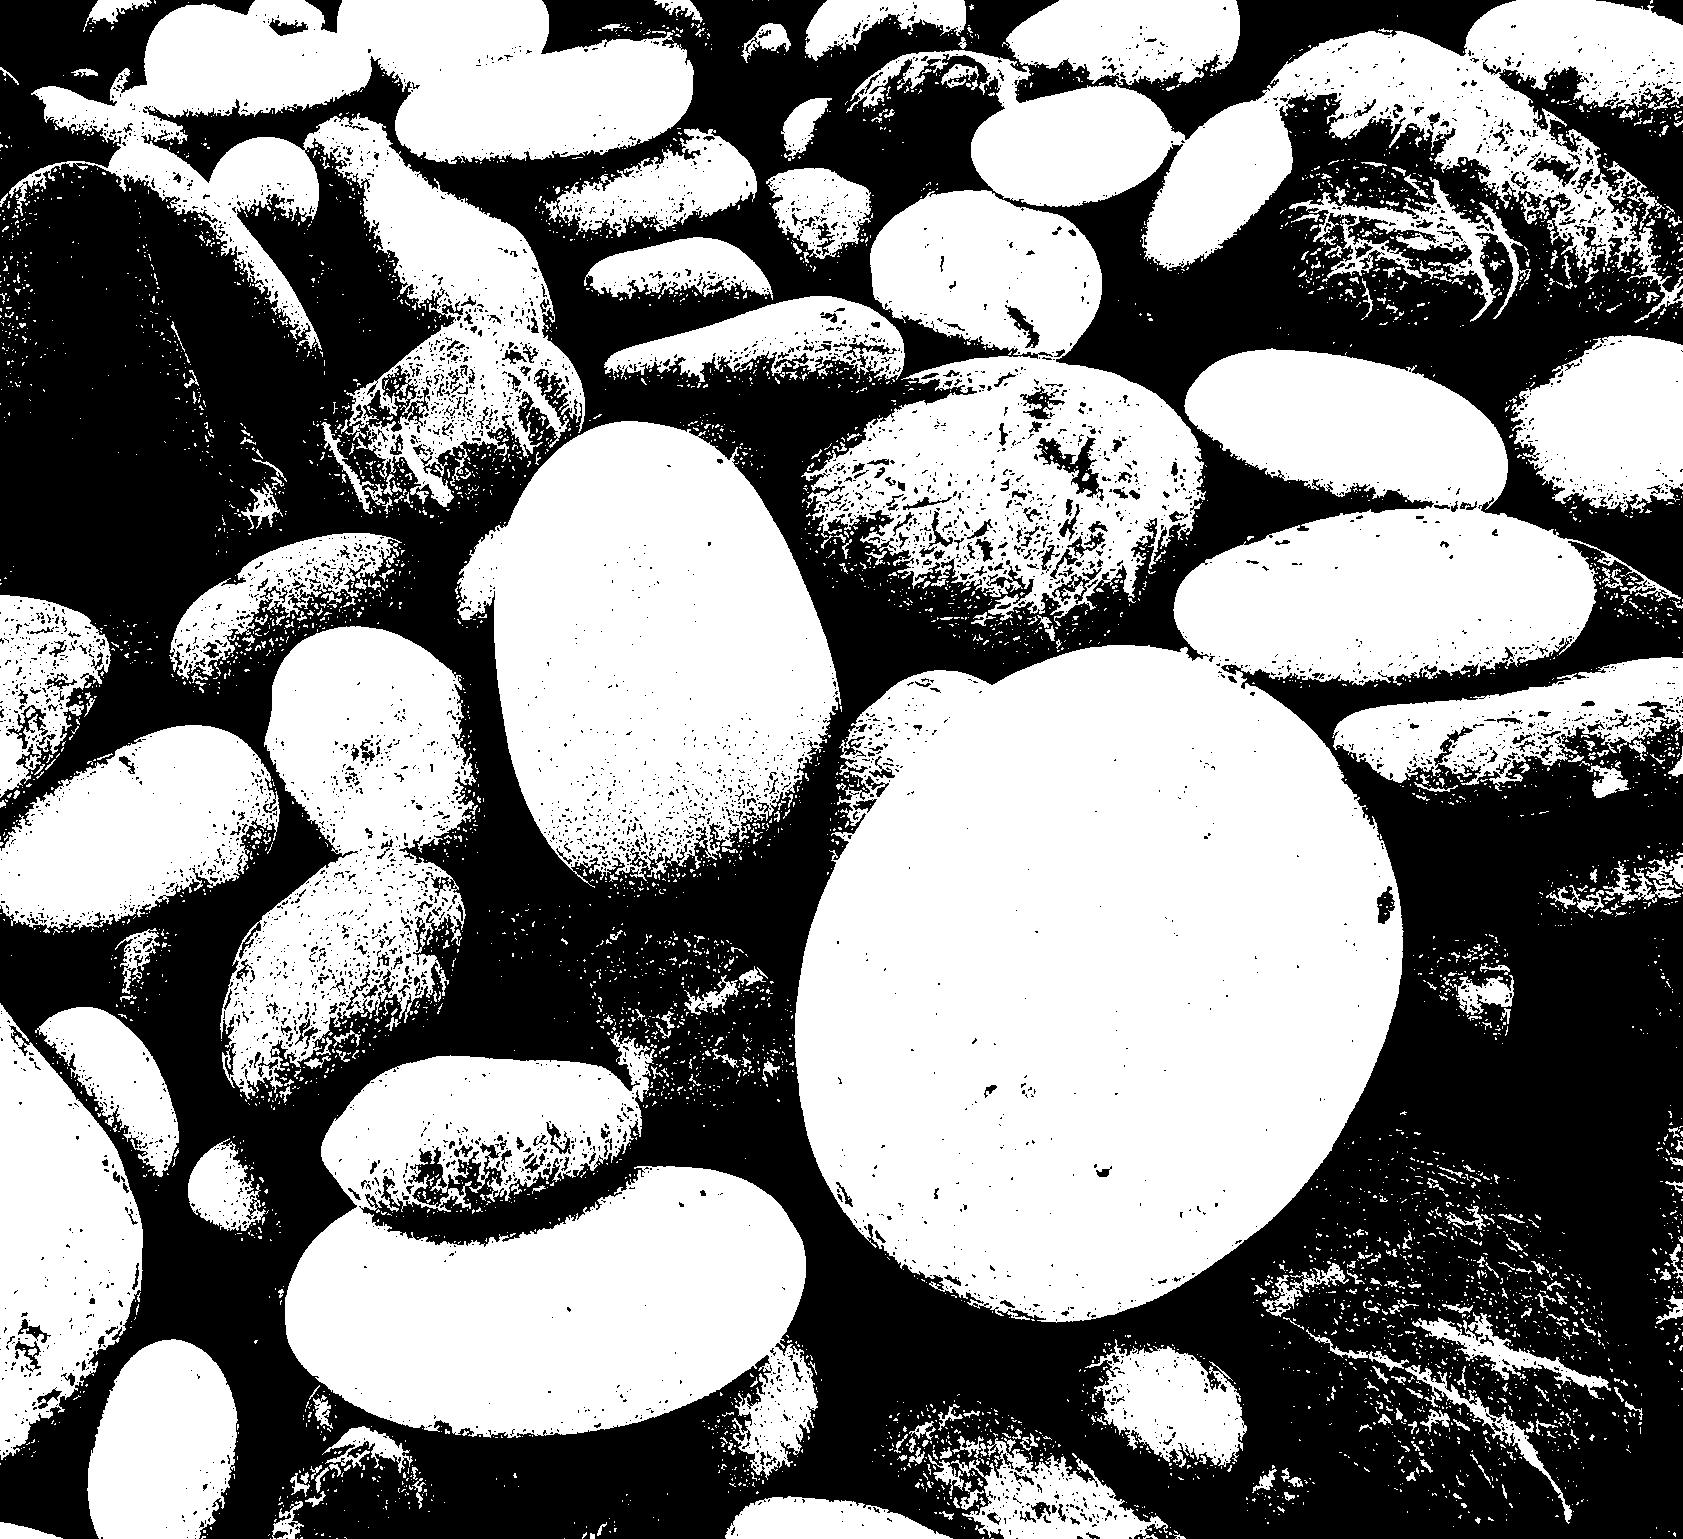 manystones-128.jpg